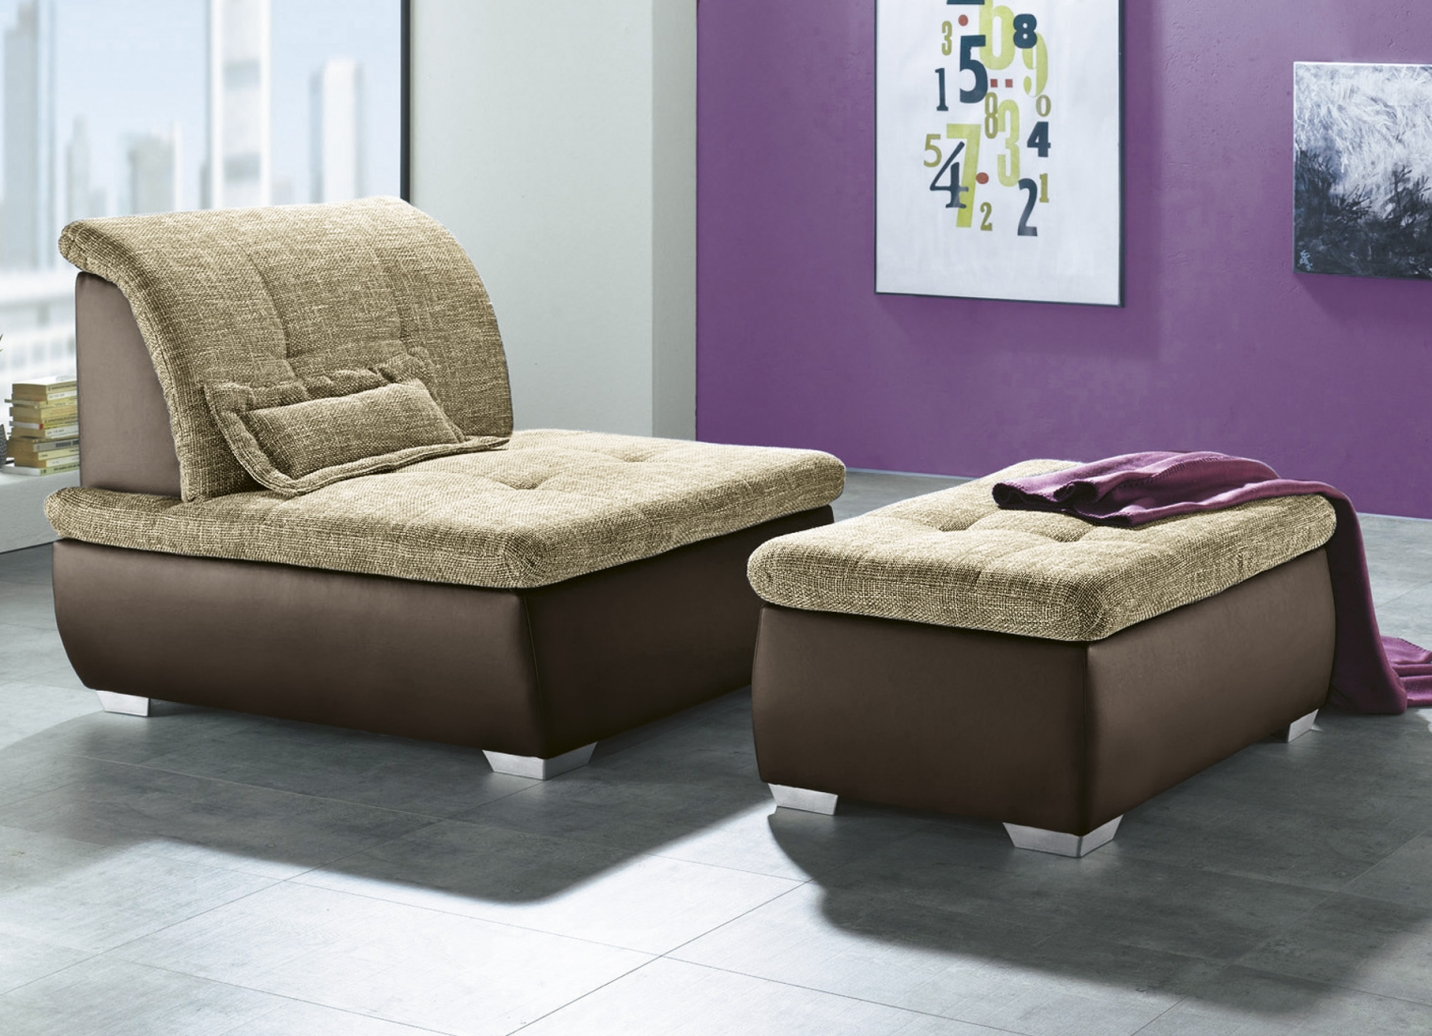 polsterm bel in verschiedenen ausf hrungen moderne m bel. Black Bedroom Furniture Sets. Home Design Ideas